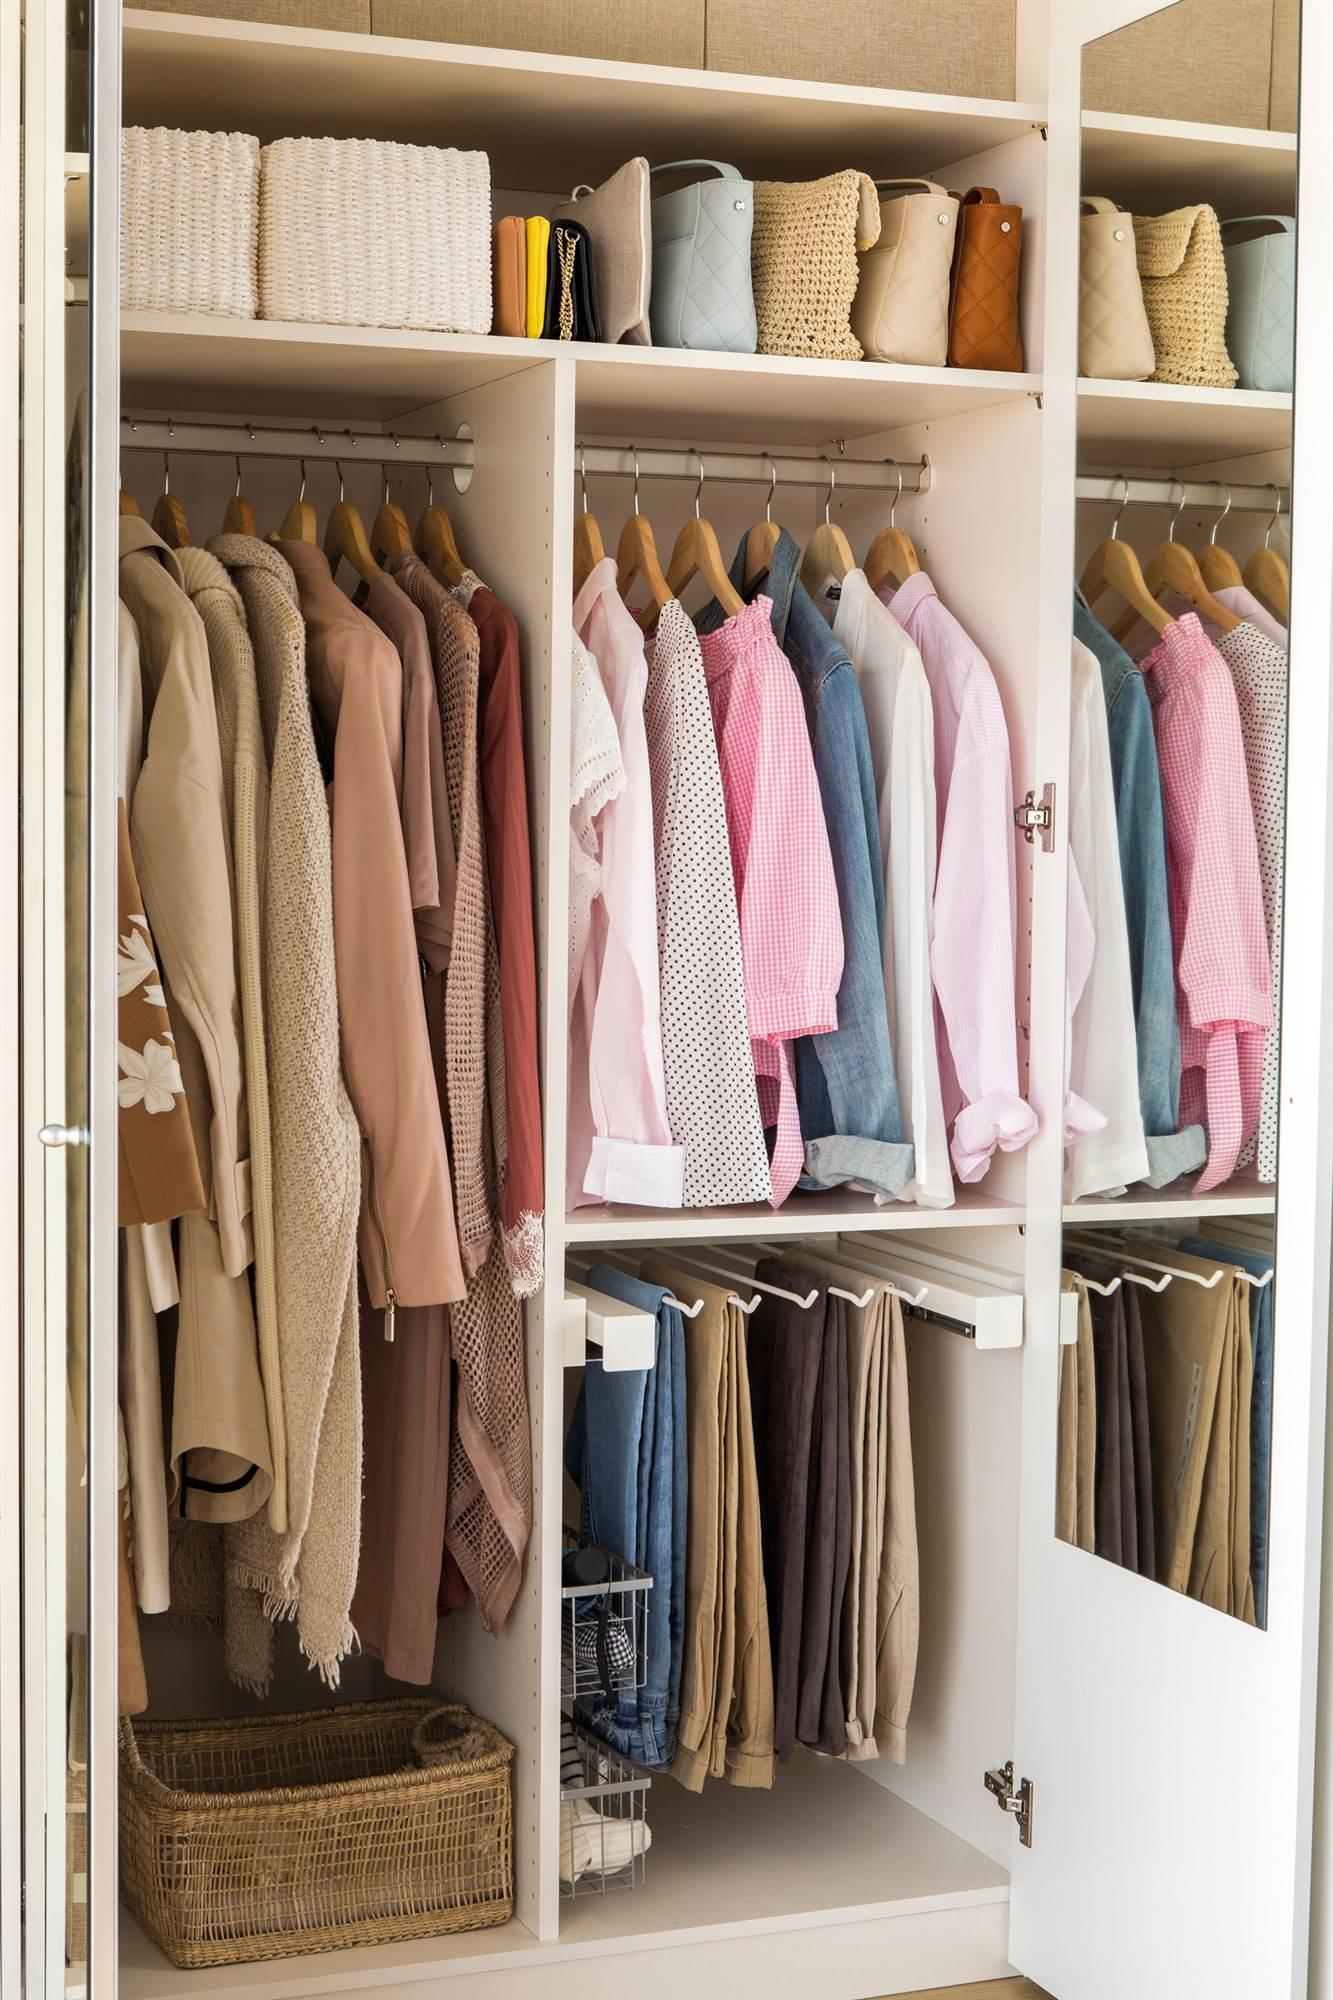 interior-armario-con-ropa-ordenada_00456532_4a8bfc9b_1333x2000.jpg